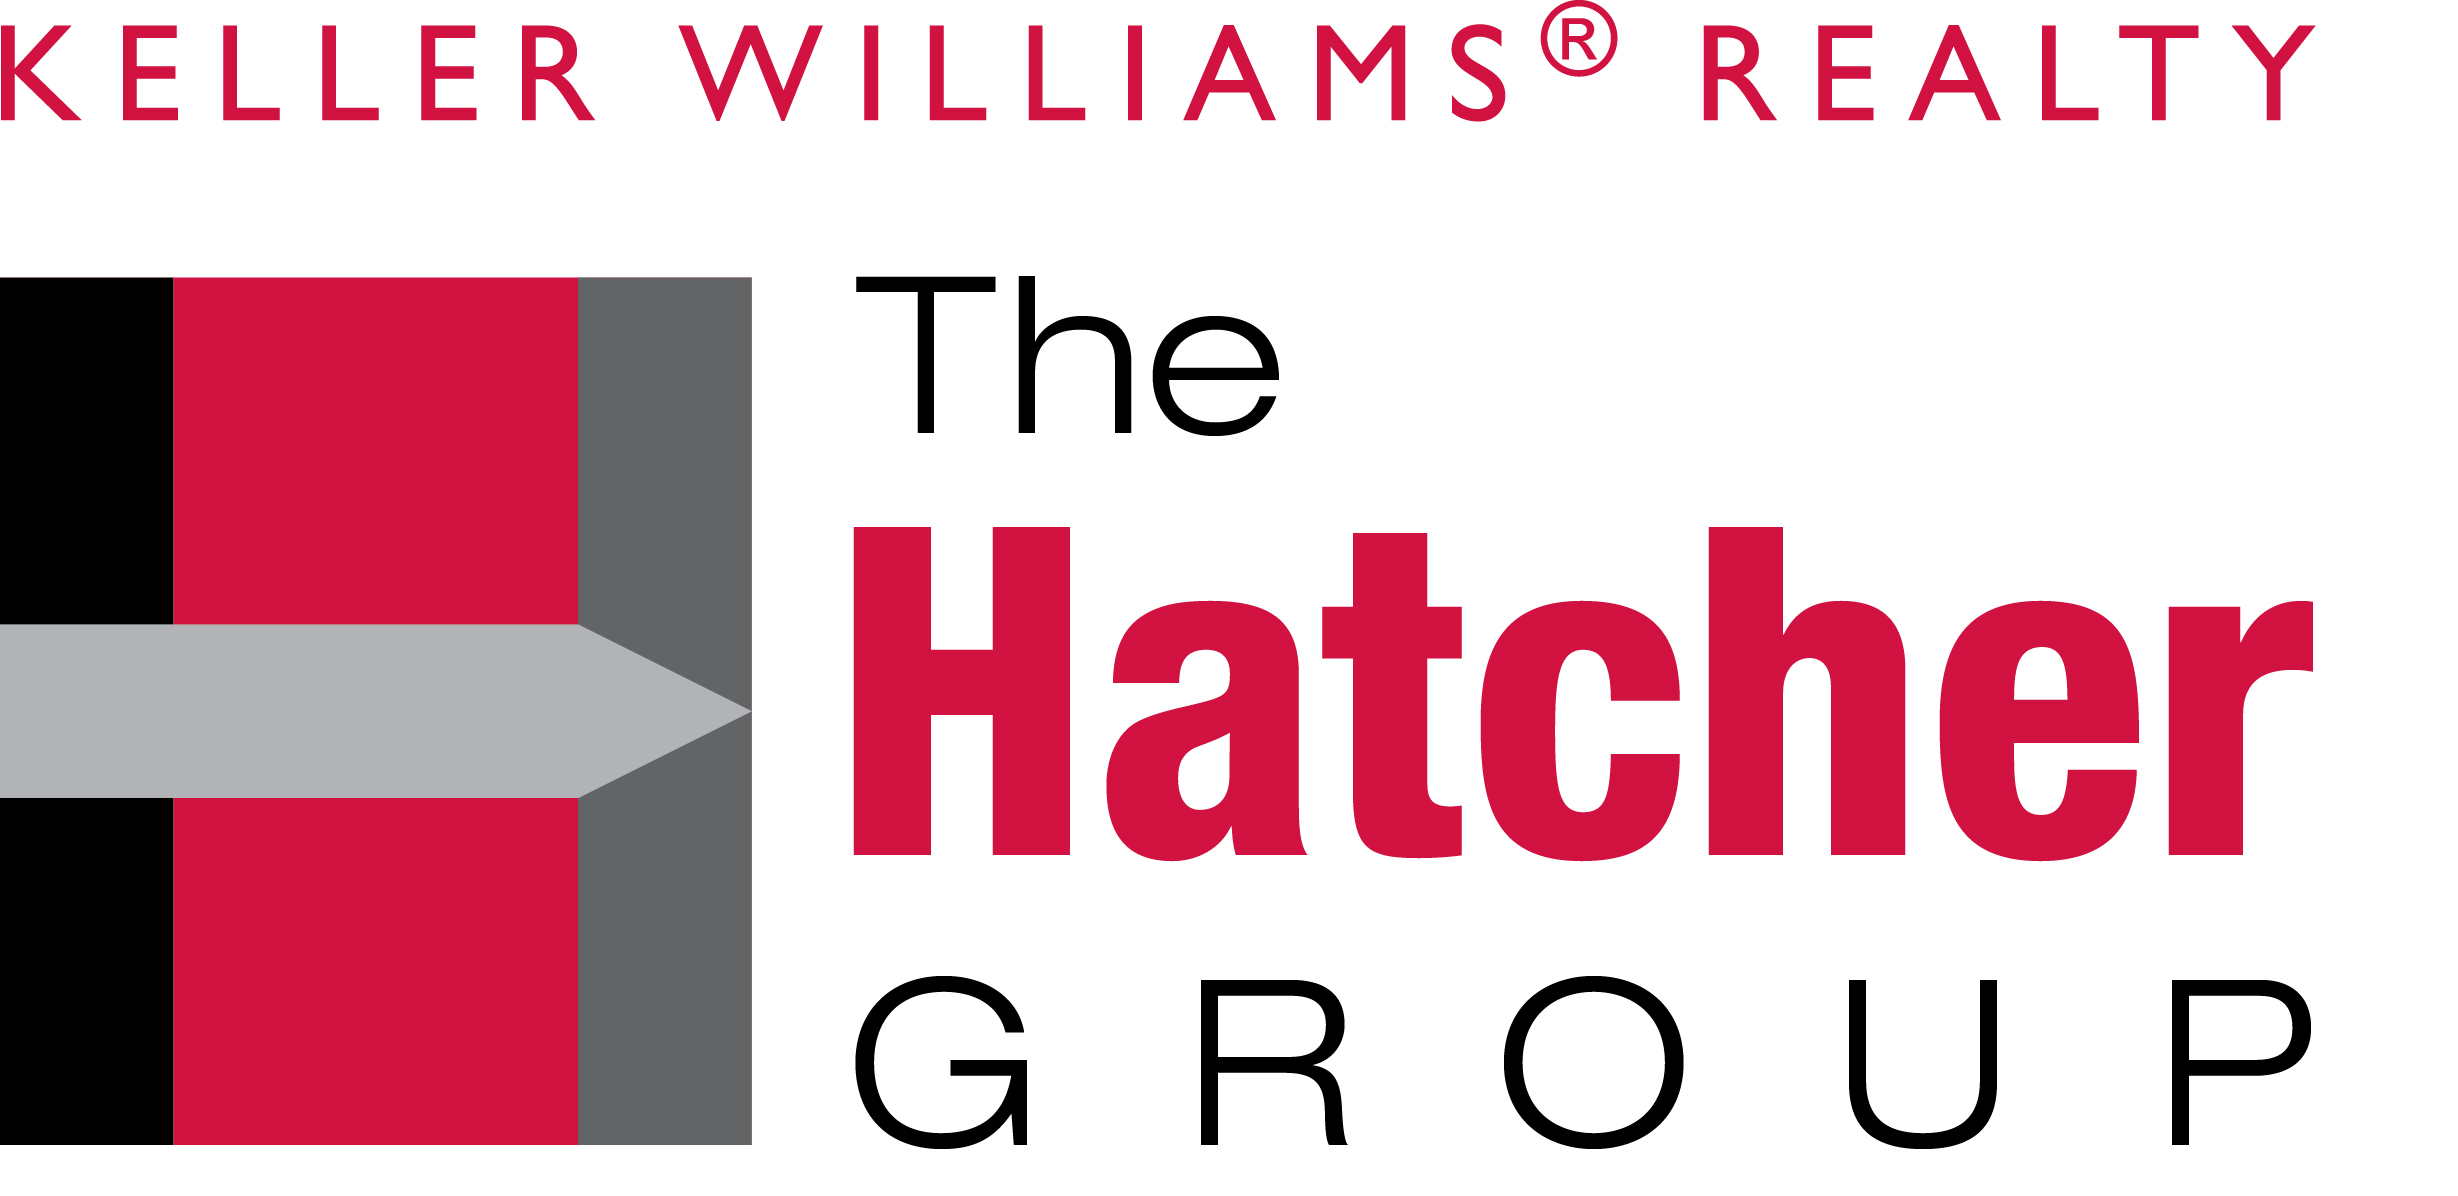 Hatcher_Group_Keller_Williams_2018.jpg